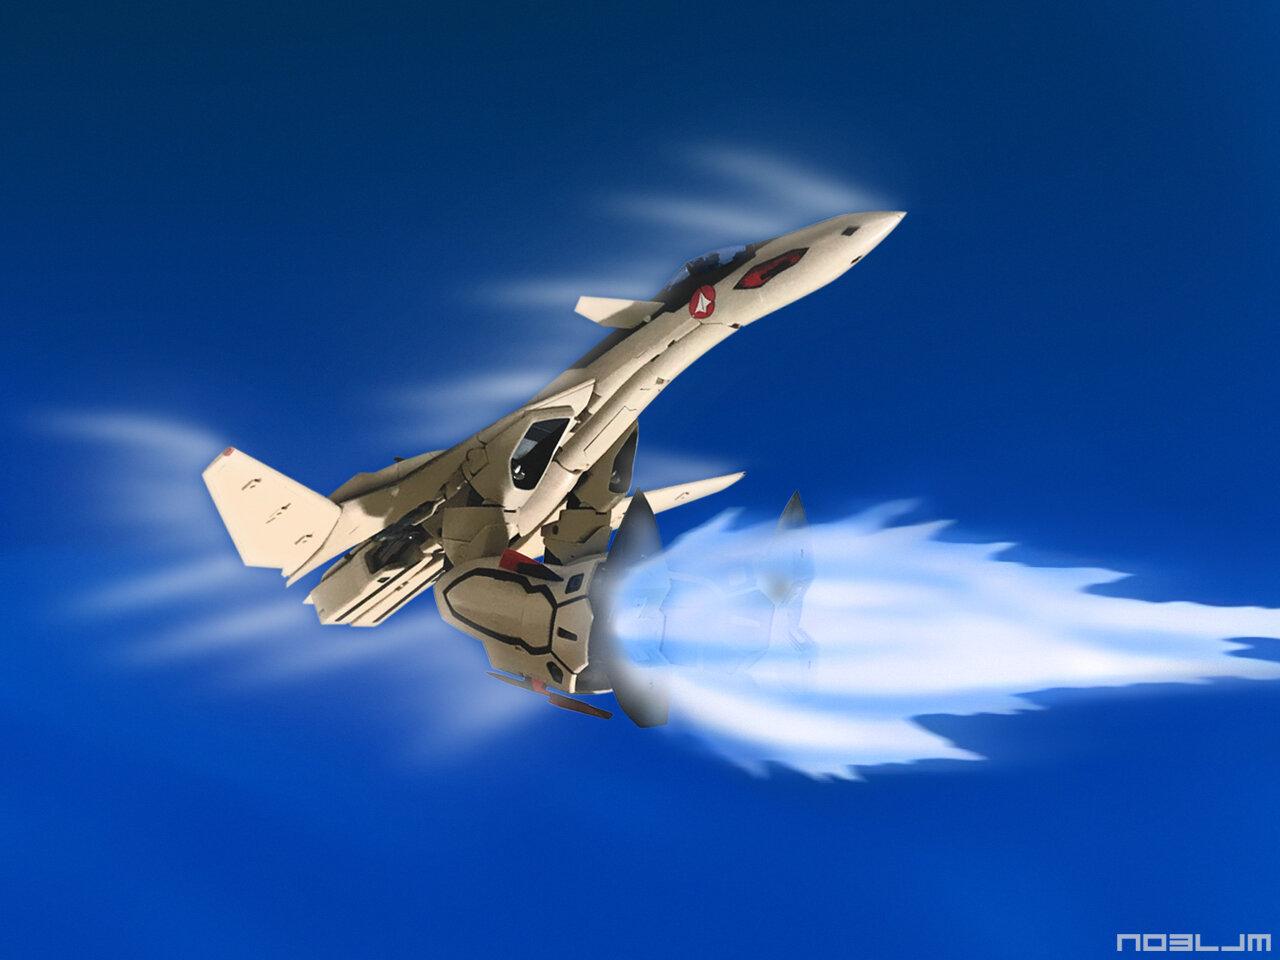 Arcadia_YF-19_Flight-Test_03.jpg.20d0820fe60d135f18a7211d07bd9a90.jpg